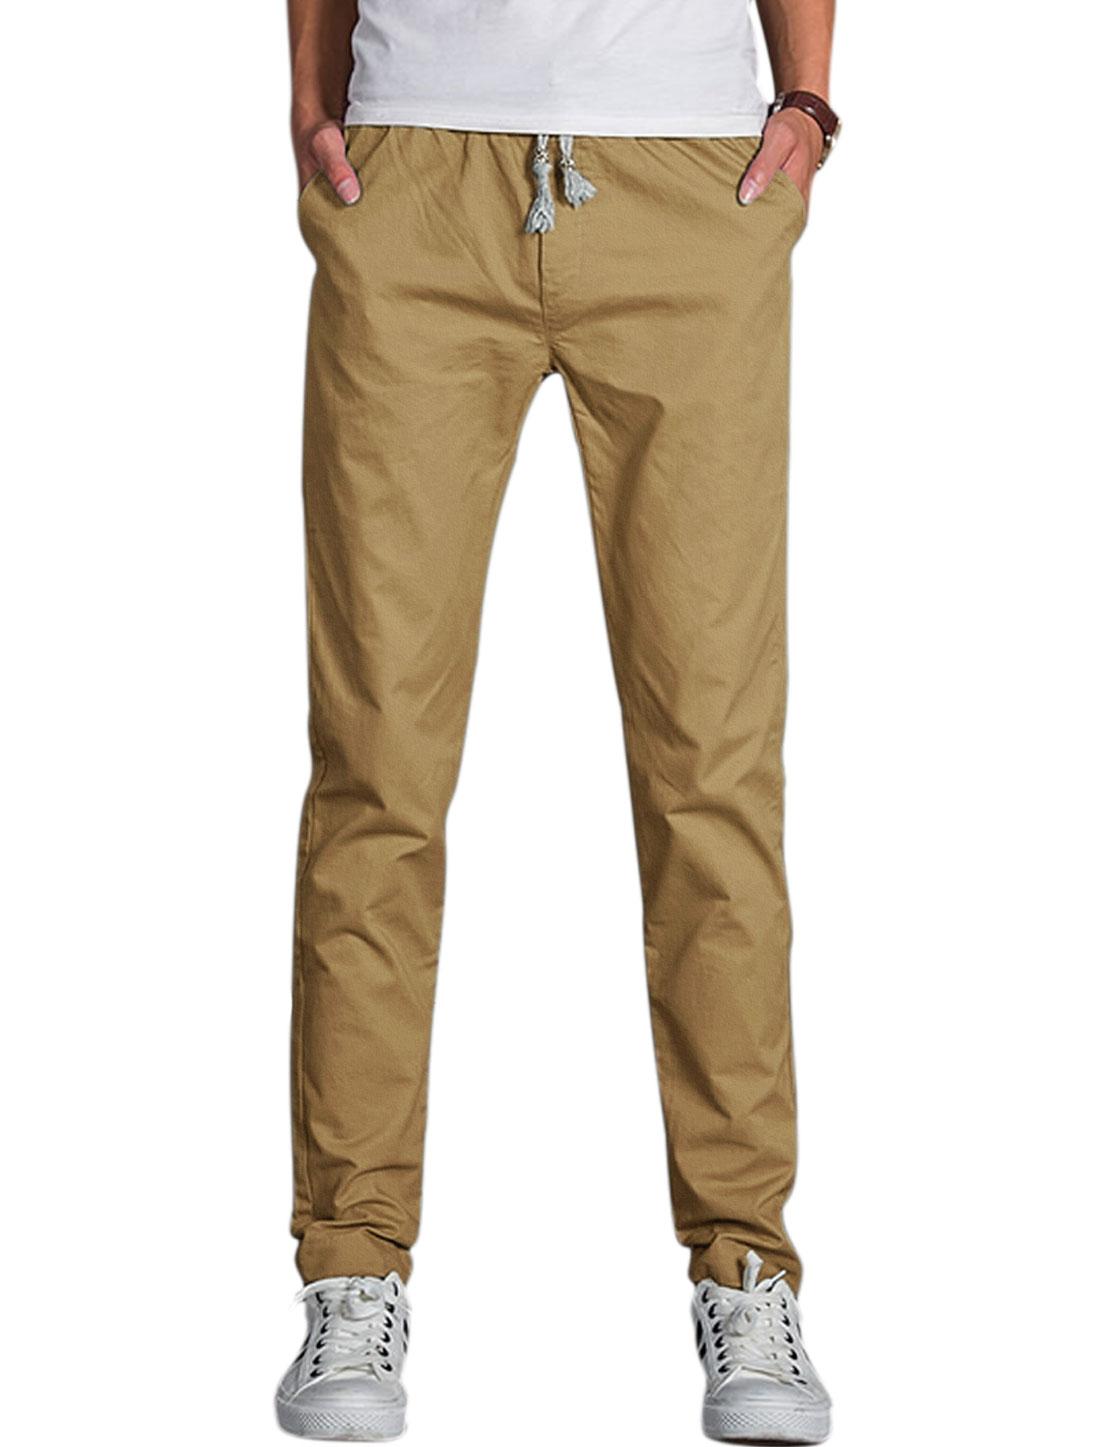 Men Elastic Waist Mid Rise Novelty Print Casual Pants Khaki W32